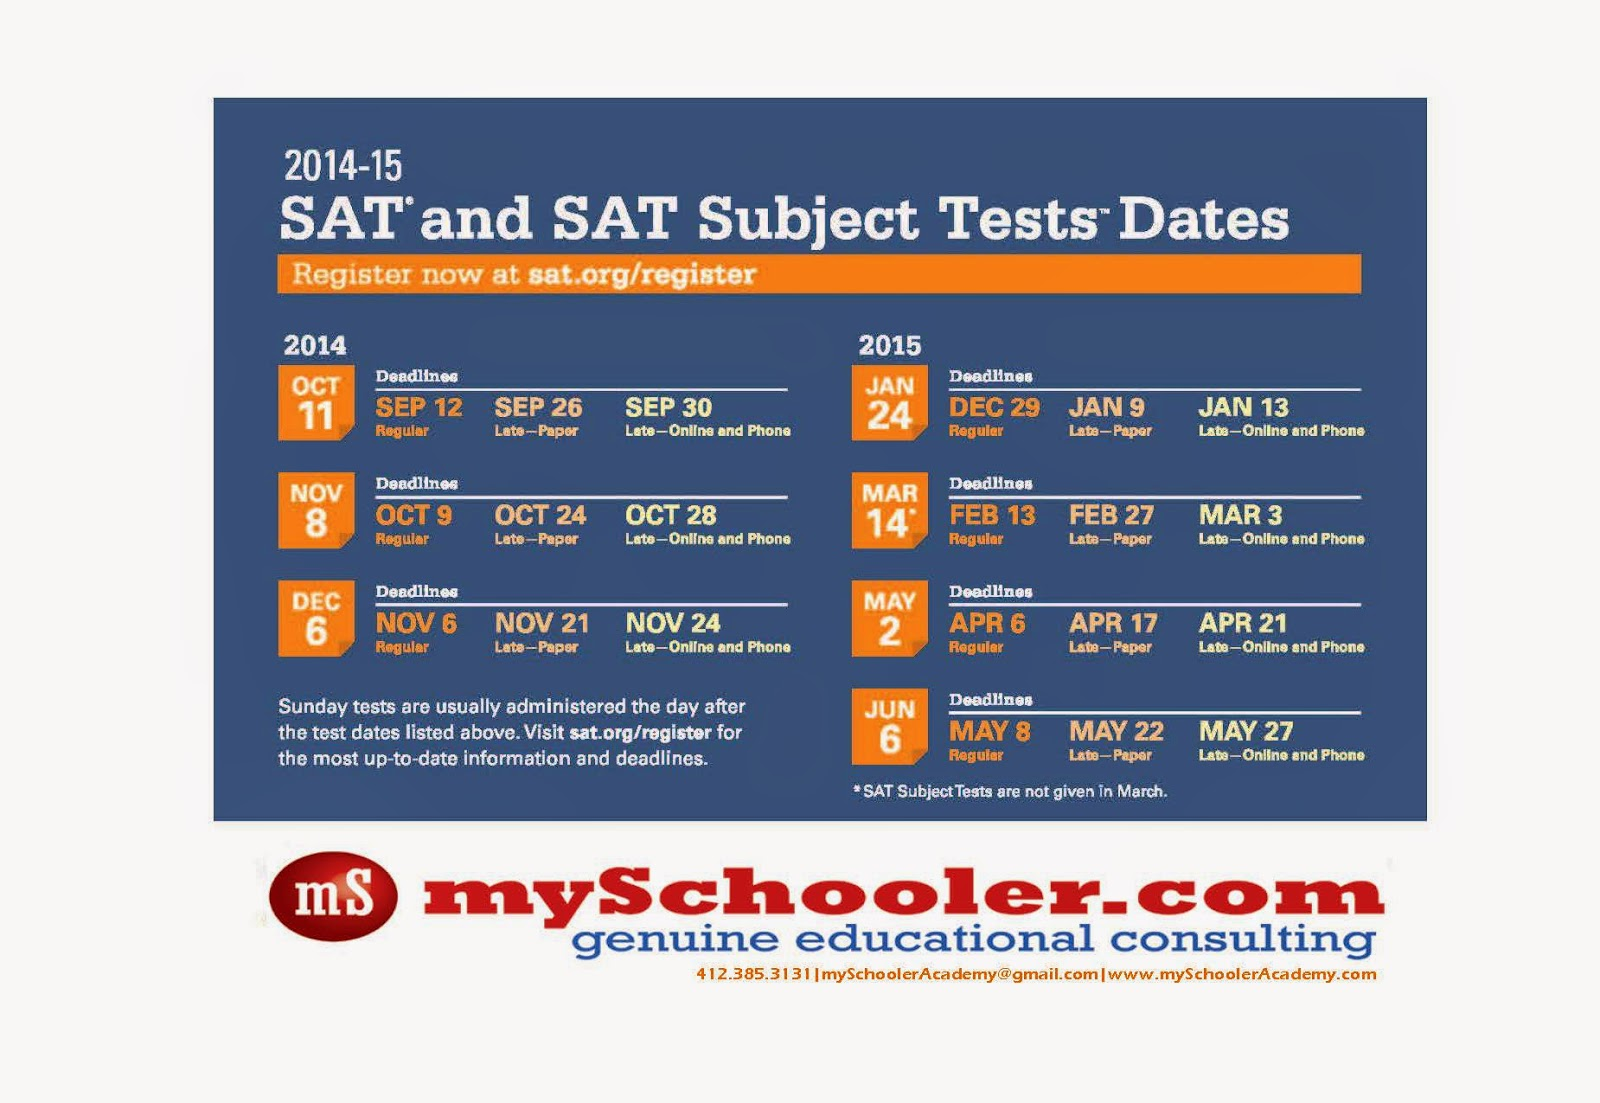 sat test dates 2015   Sanli Education HK #1 SAT SSAT ACT Debate